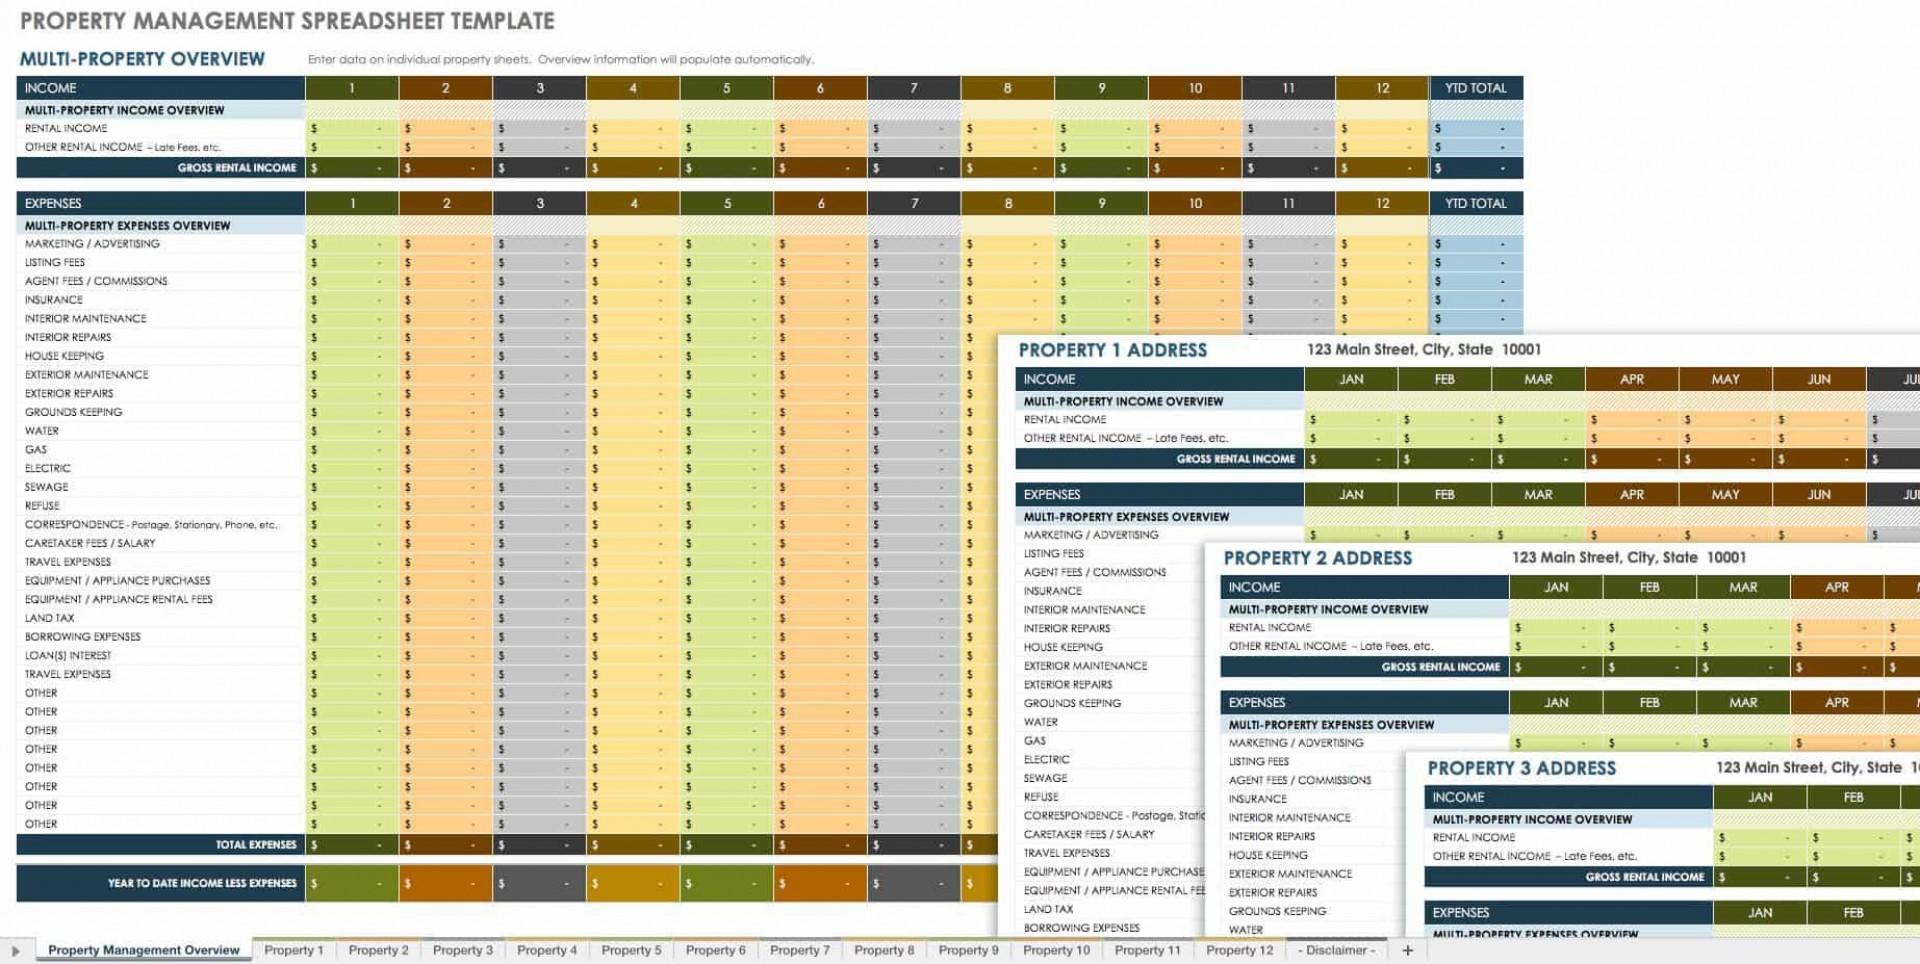 006 Breathtaking Property Management Maintenance Checklist Template Sample  Free1920